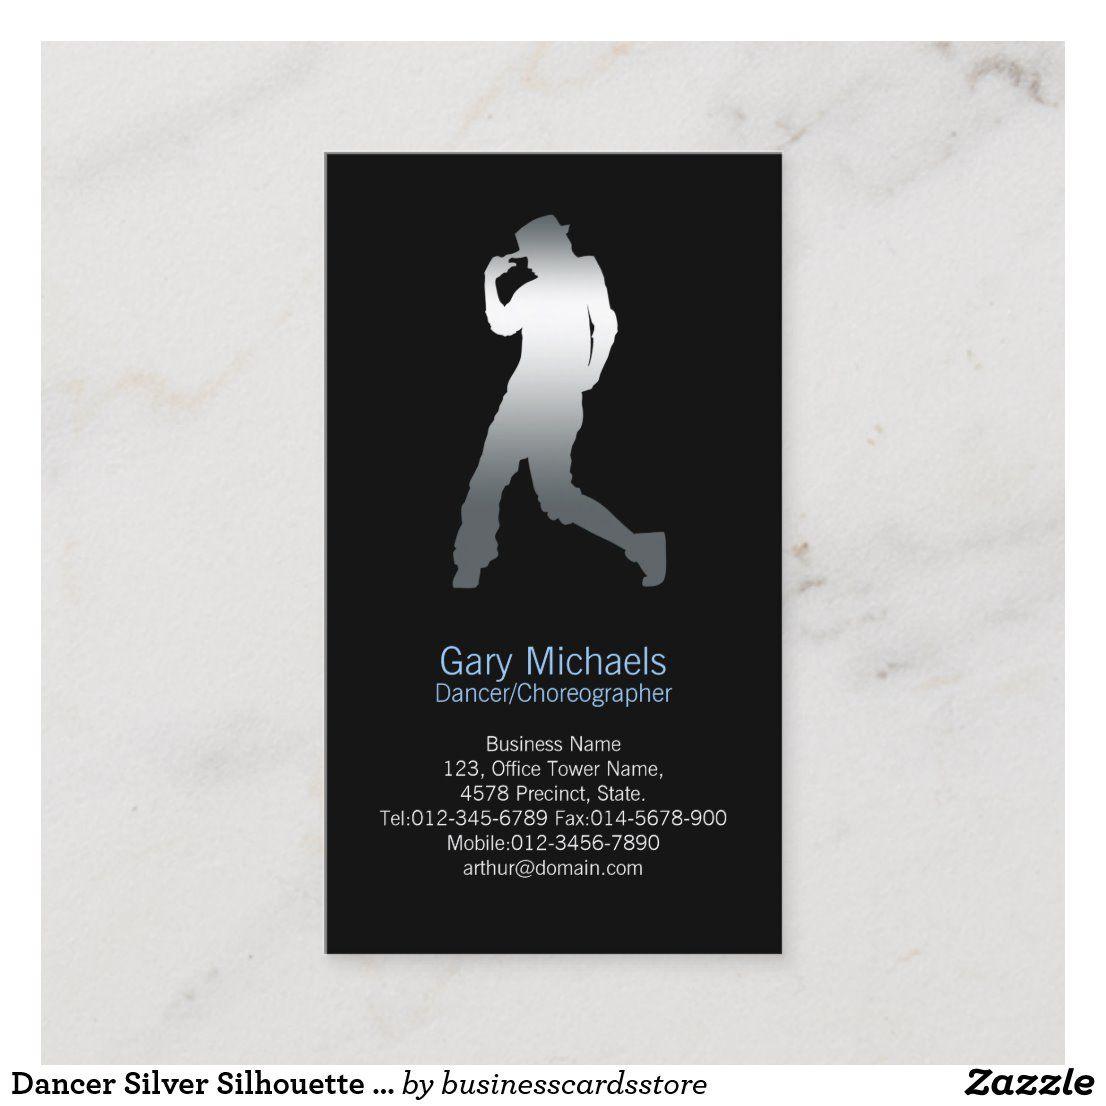 Dancer Silver Silhouette Dancer Business Card Zazzle Com Dancer Business Card Dancer Silhouette